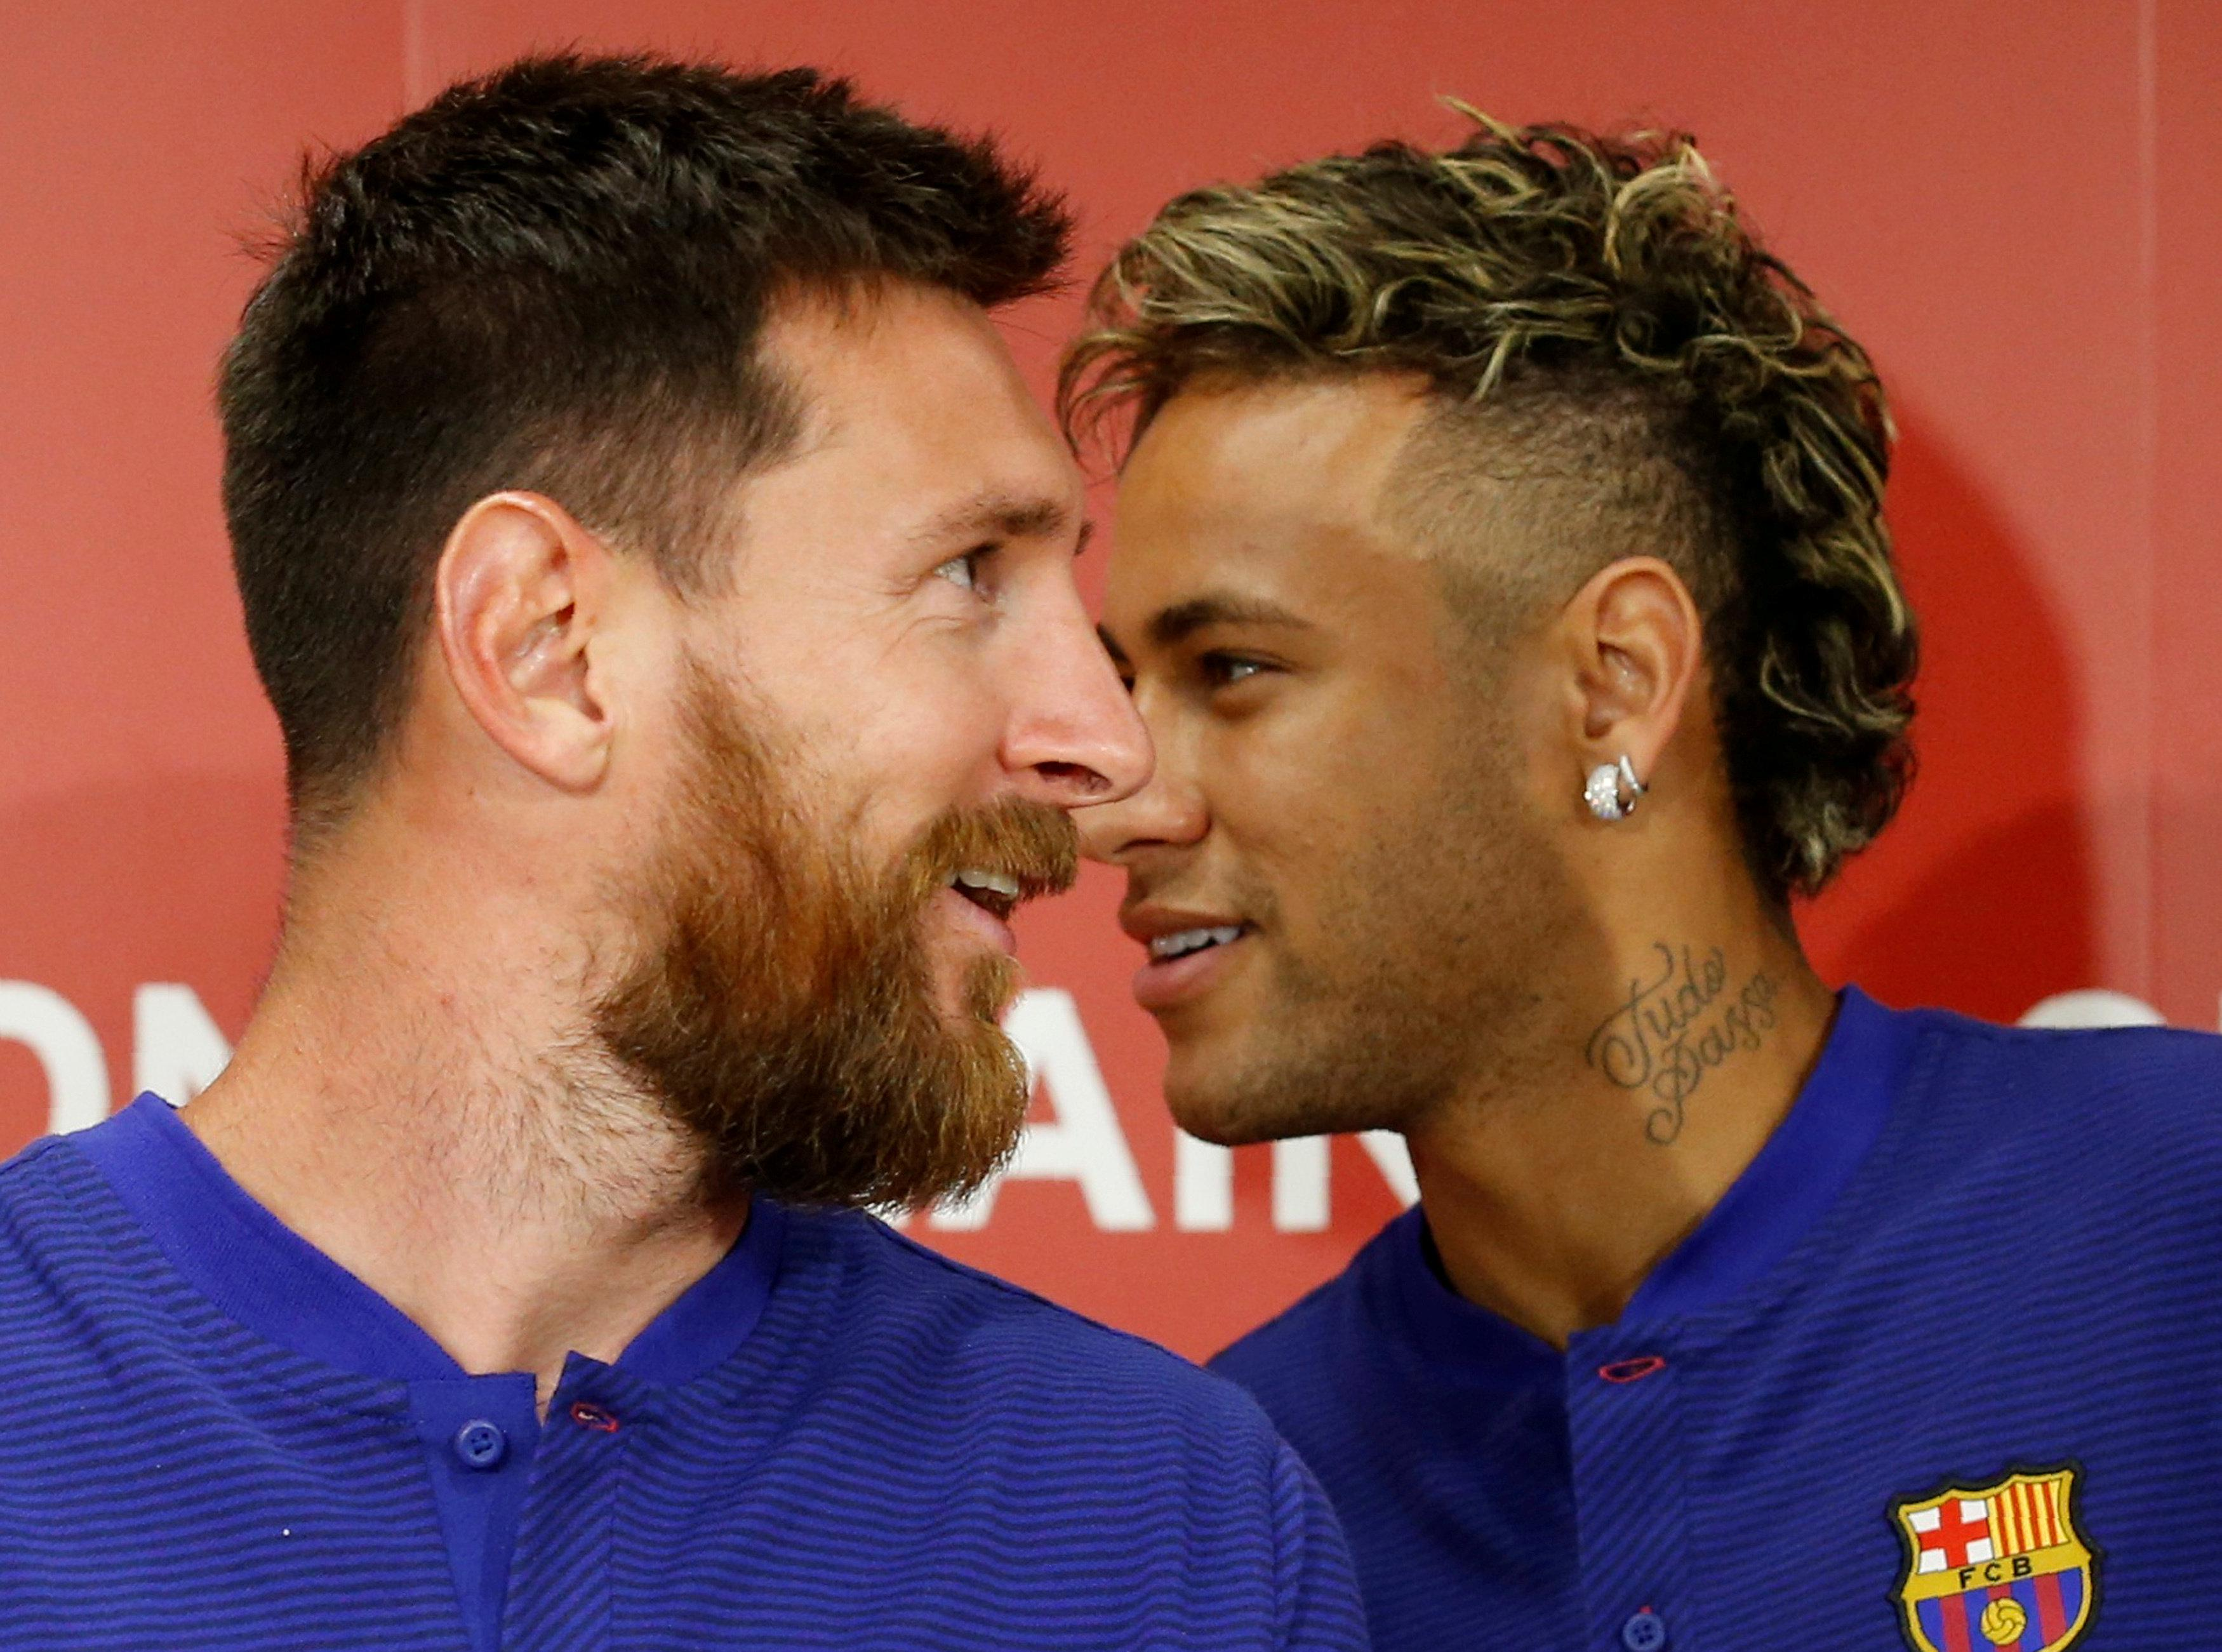 Messi's shadow looms over Neymar